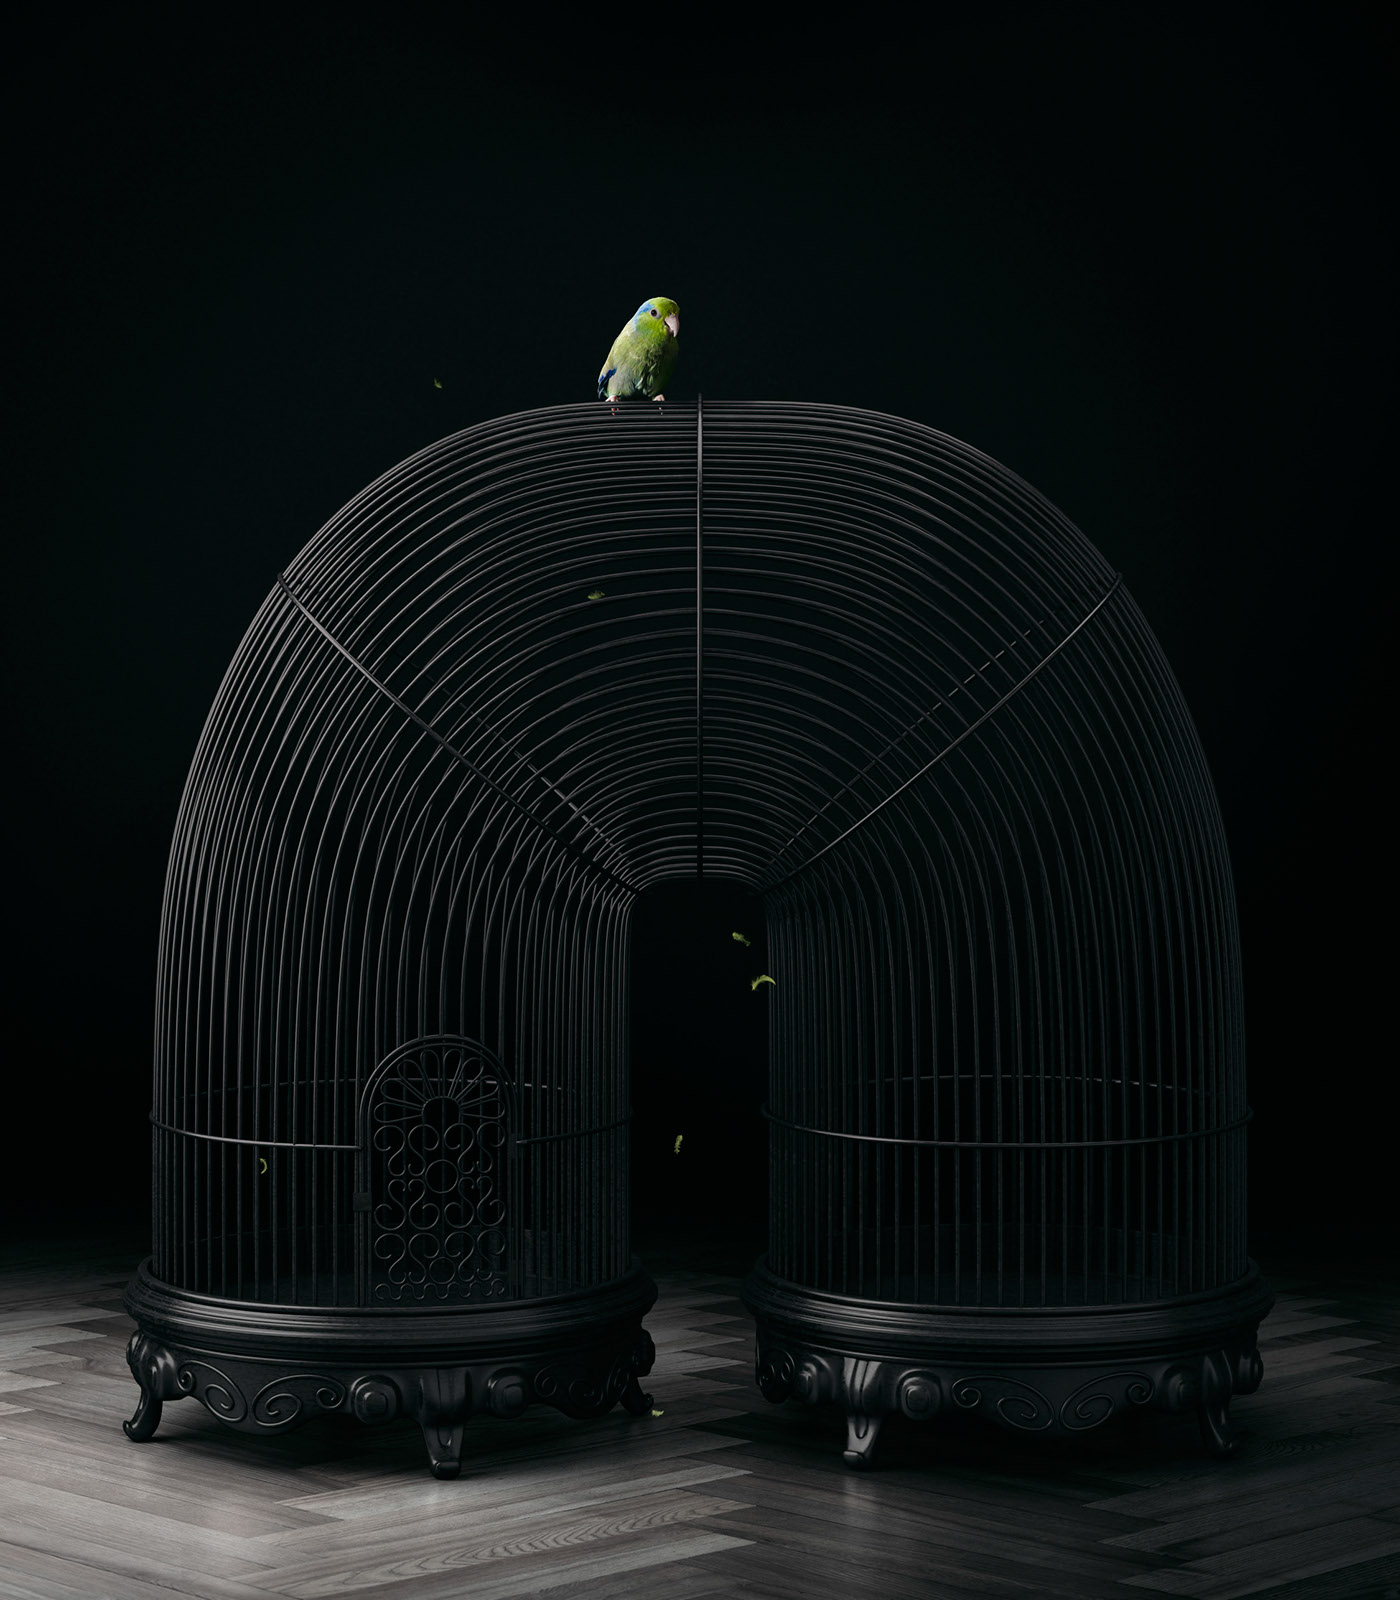 FREE BIRD / фото Mike Campau